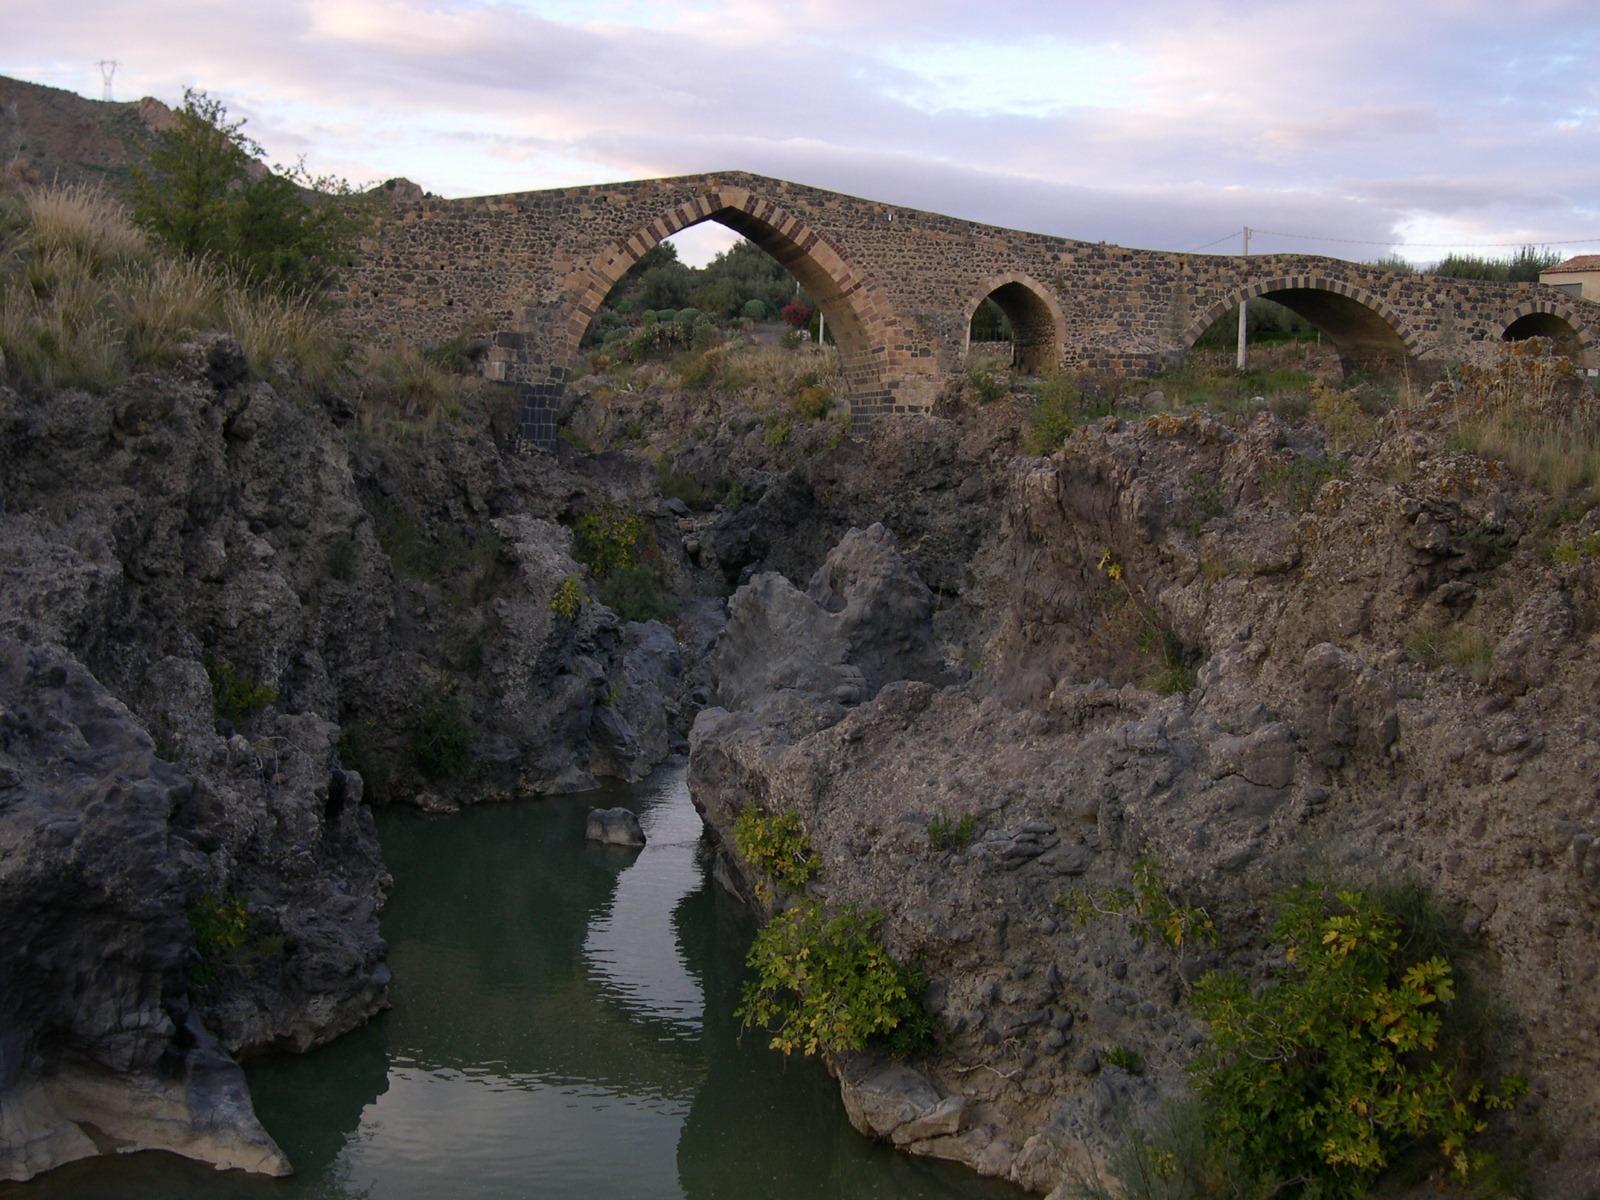 Ponte_dei_saraceni autor archenzo cc